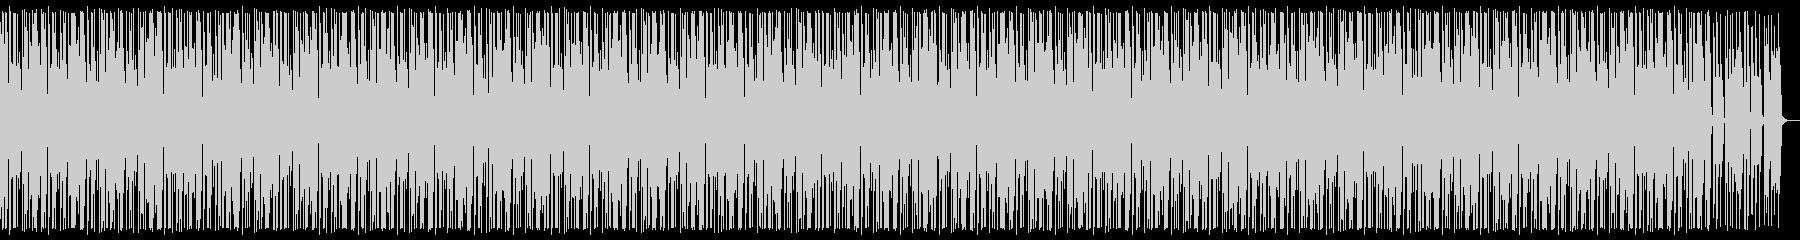 Enjoy Halloween Marimba Dark's unreproduced waveform